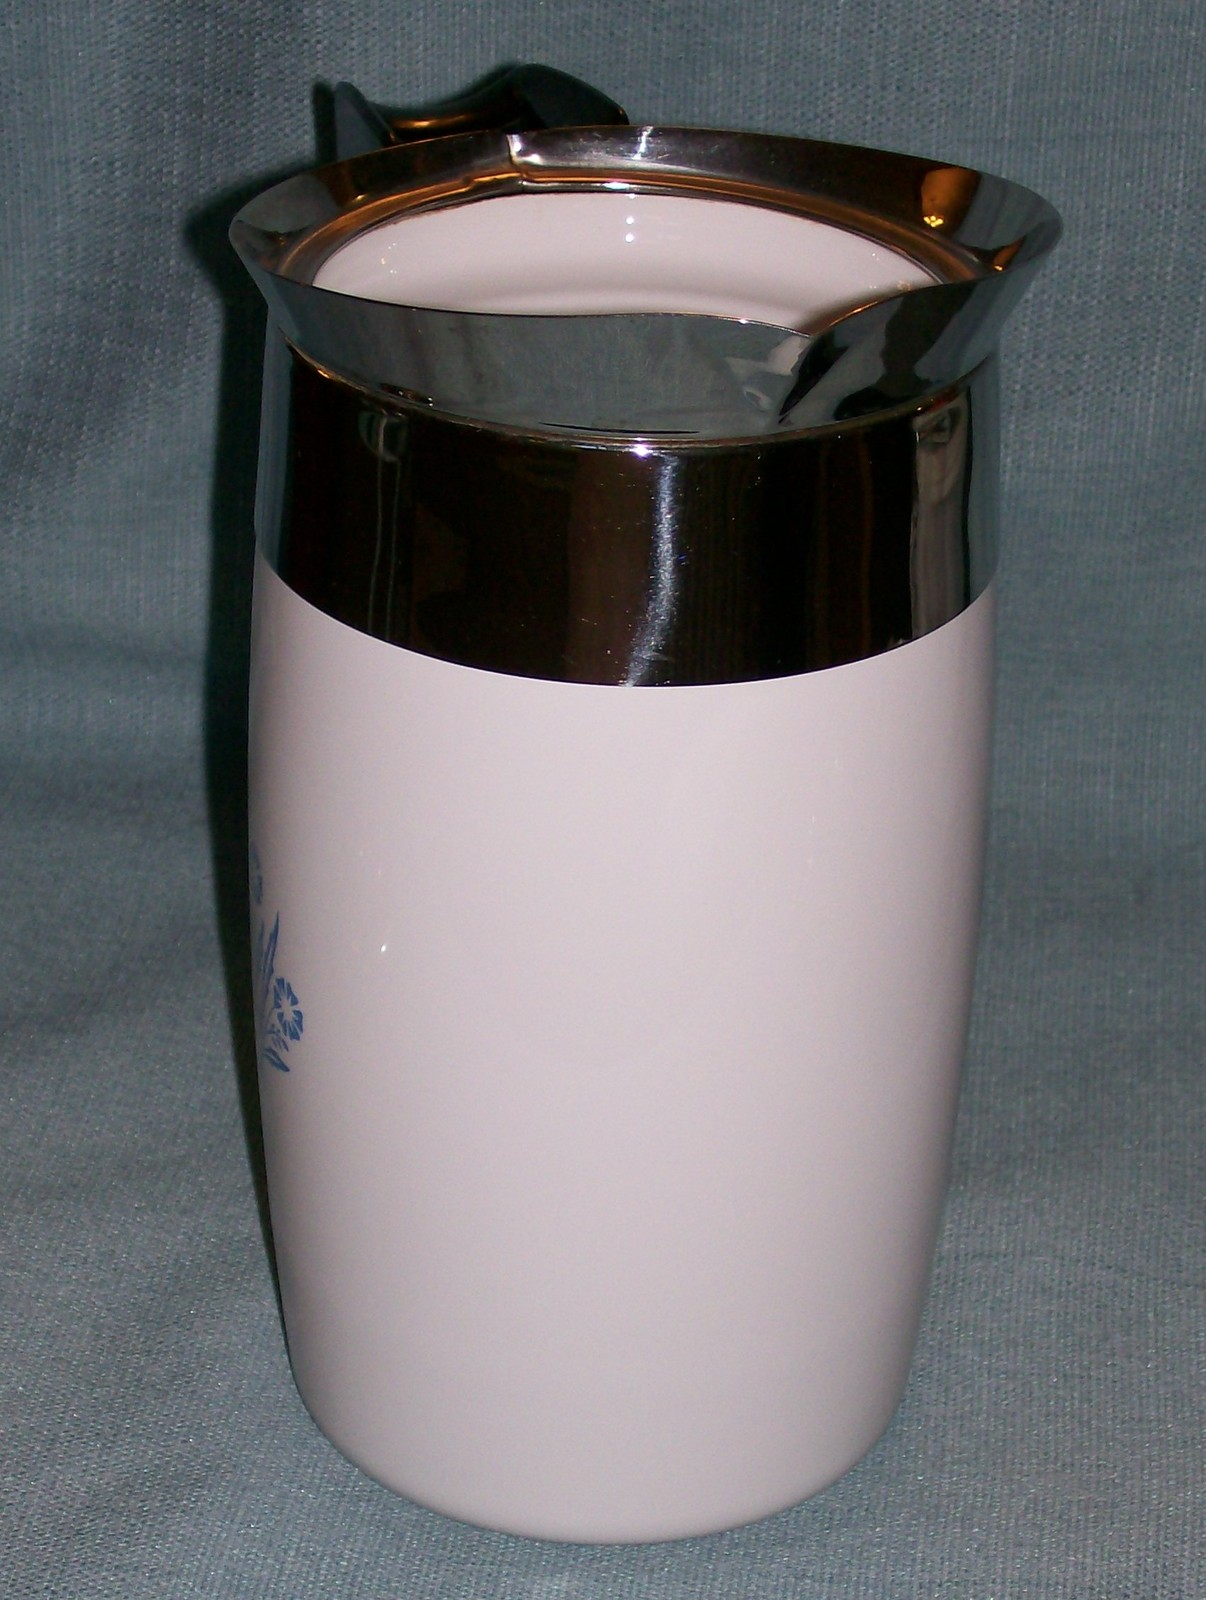 Corning Ware BLUE CORNFLOWER Electric Coffee Pot/Percolator 6 cup P-6-EP VGVC  image 3